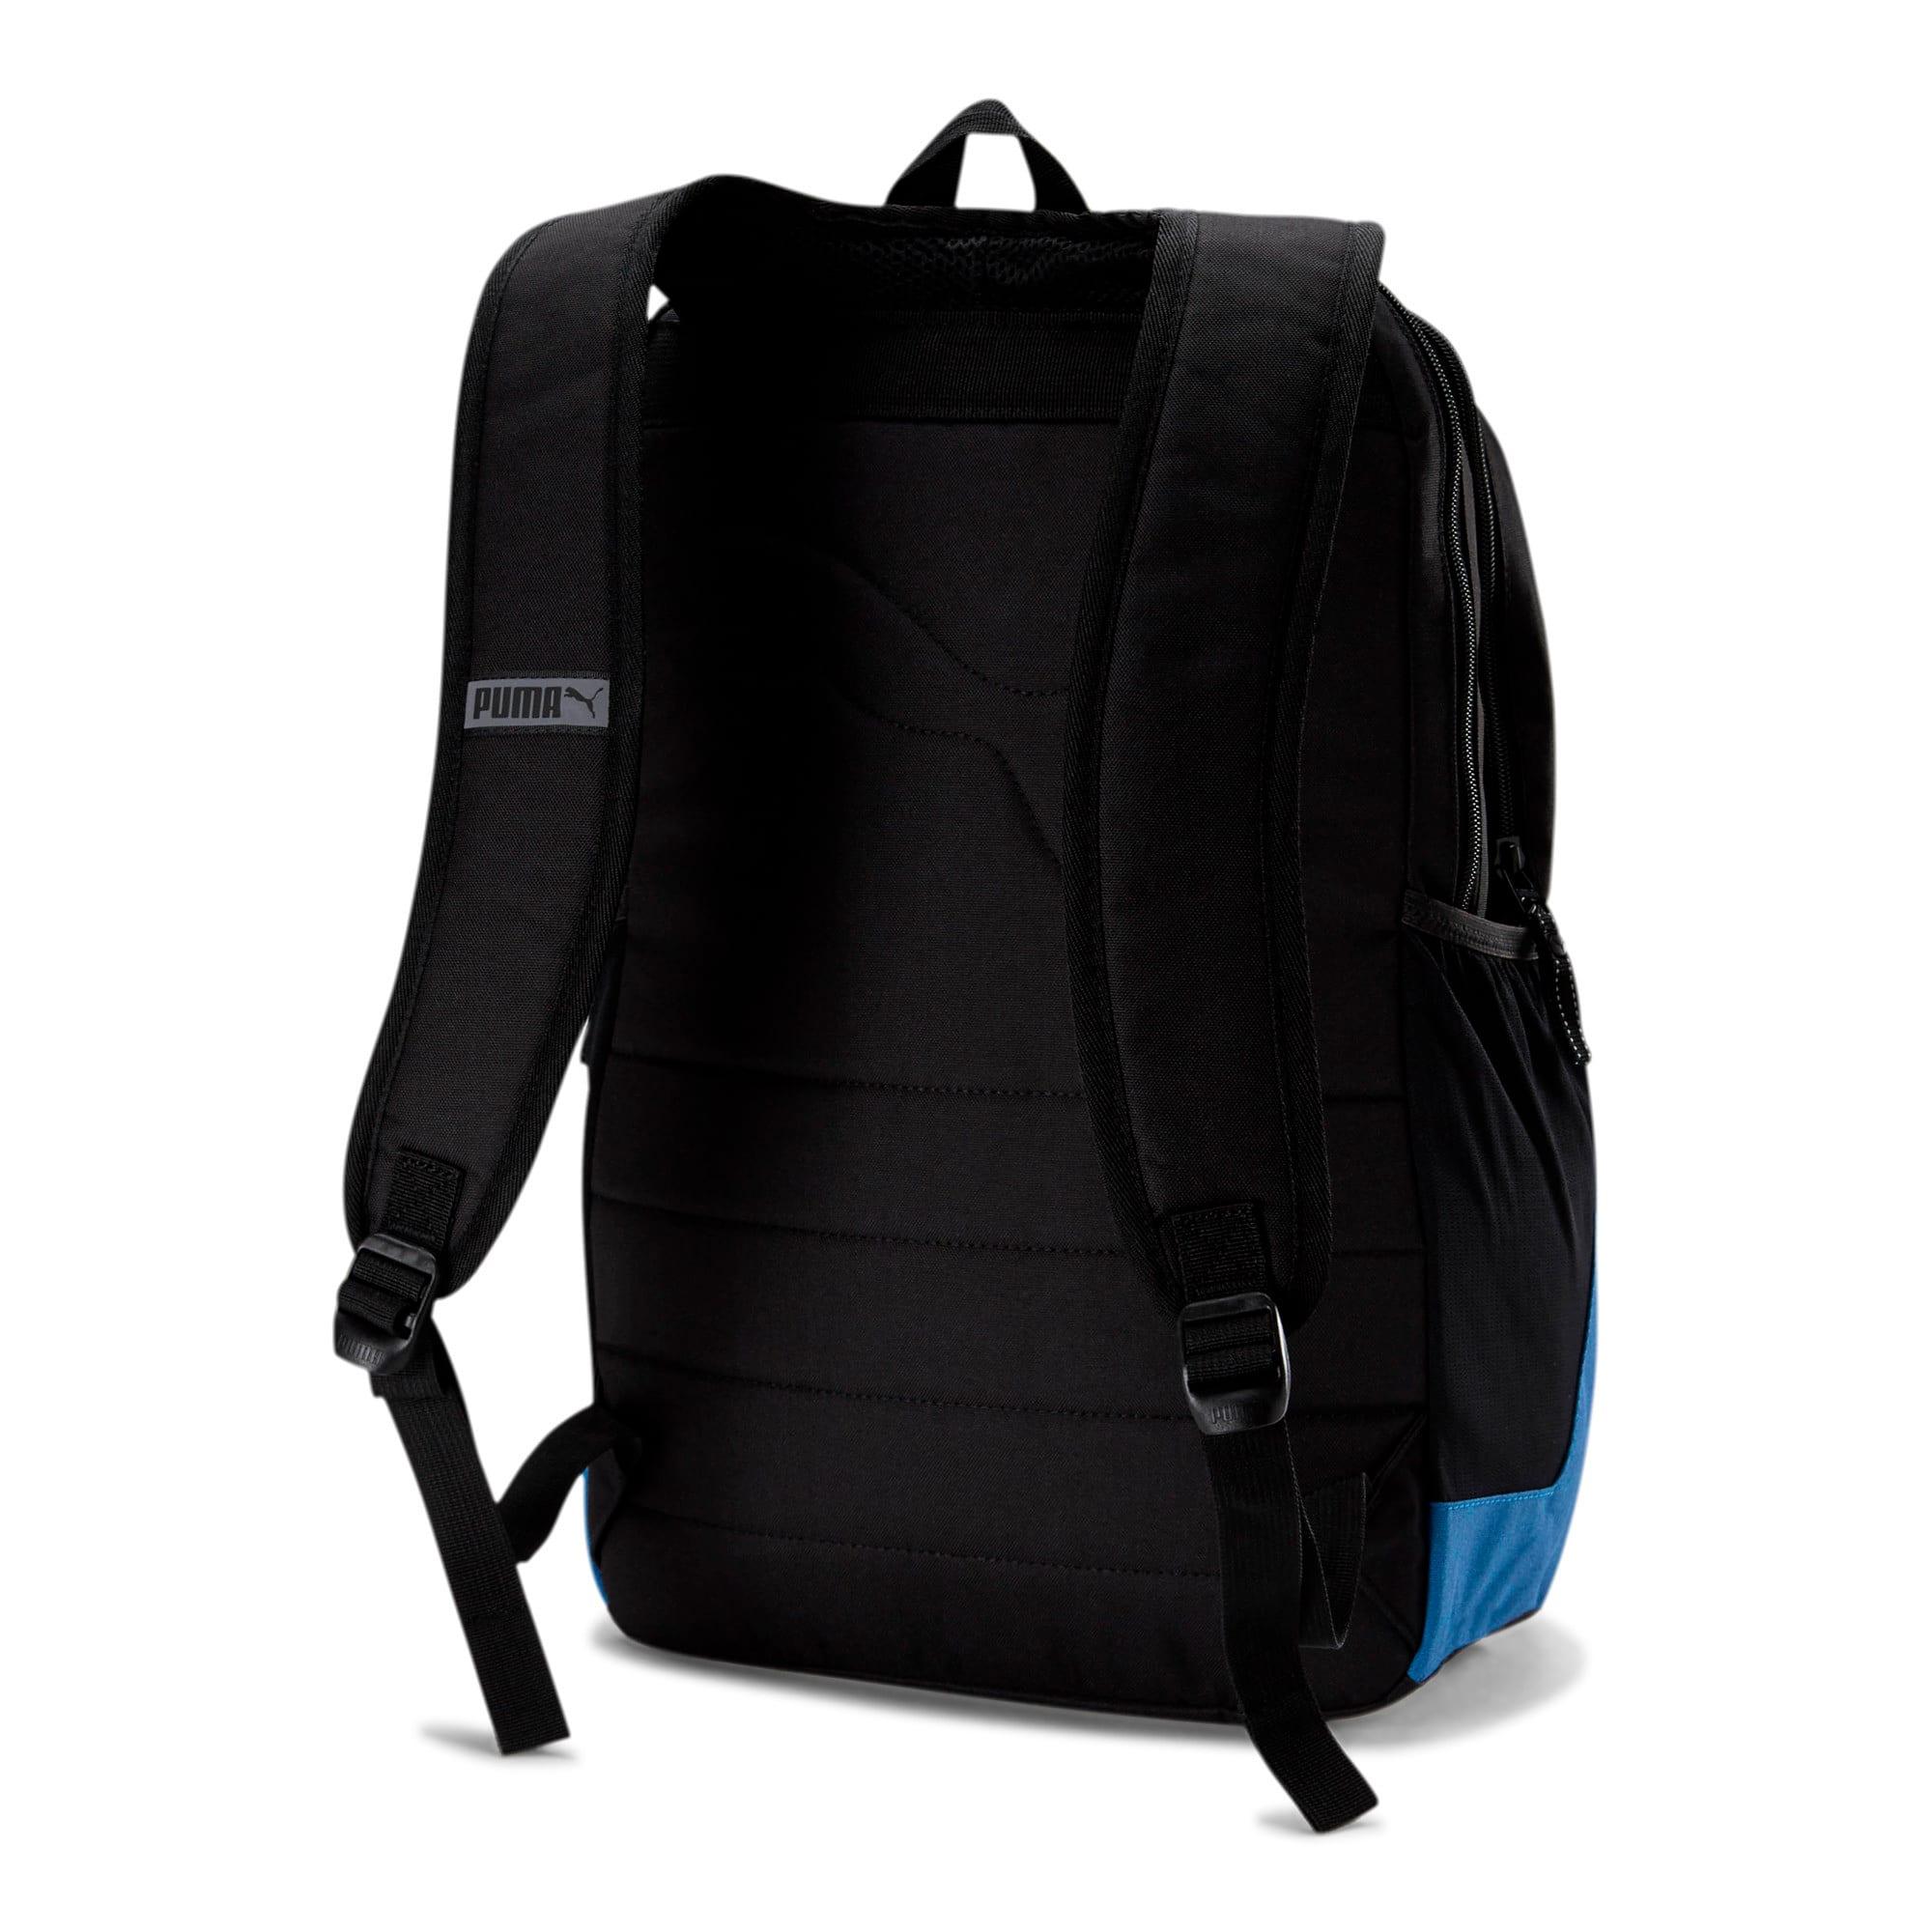 Thumbnail 2 of PUMA Everready Backpack, Blue, medium